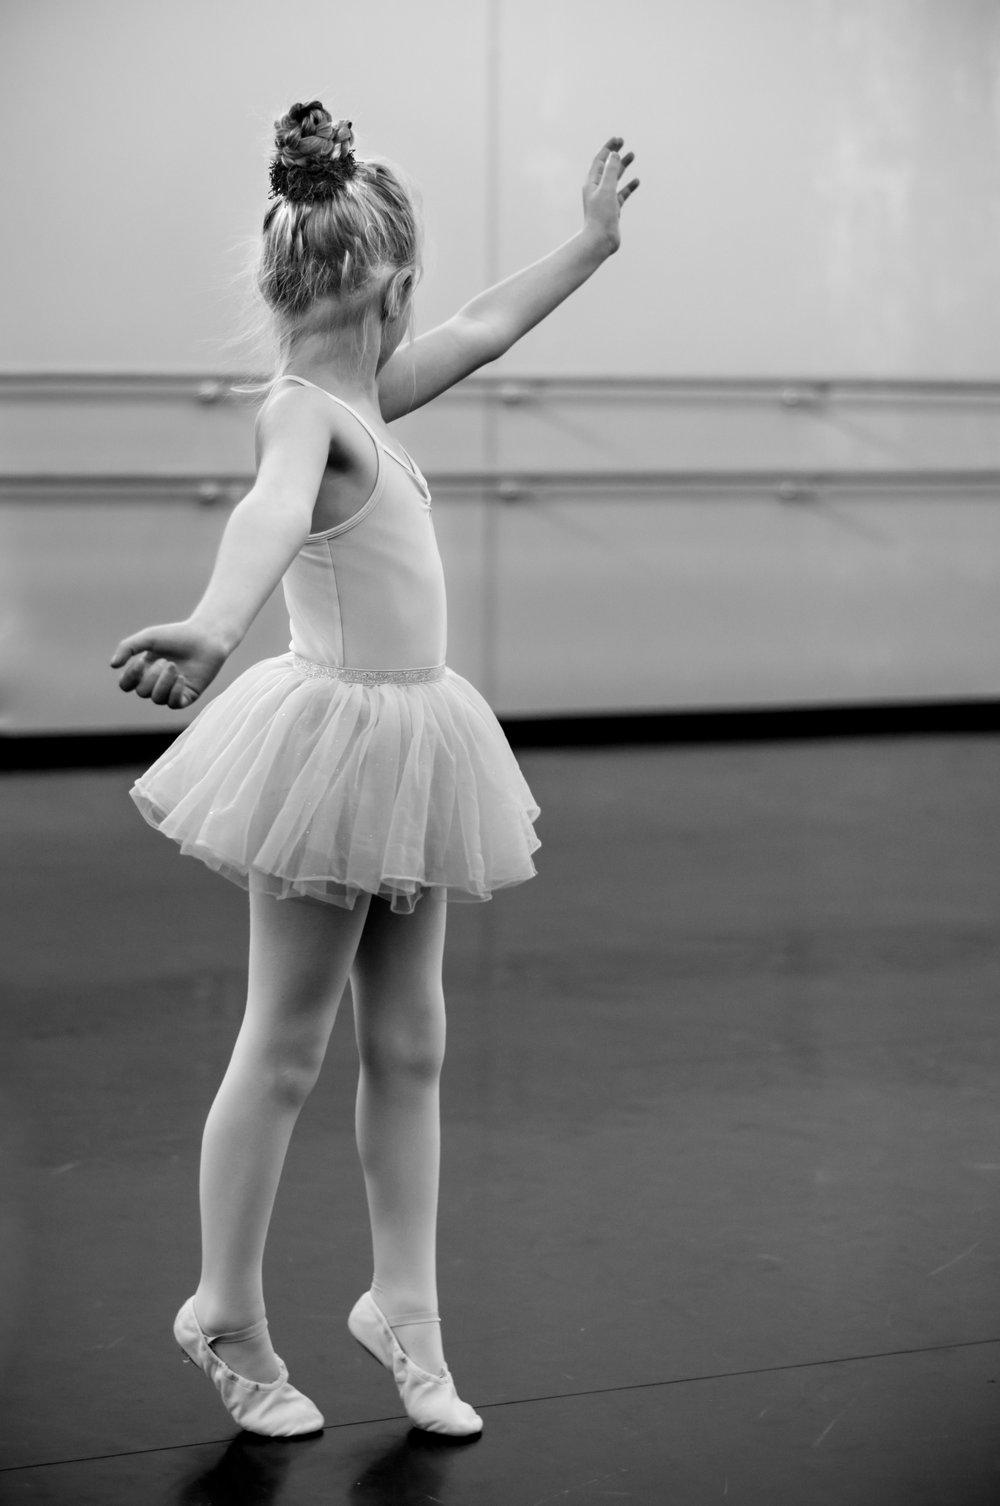 athlete-balance-ballerina-591679.jpg